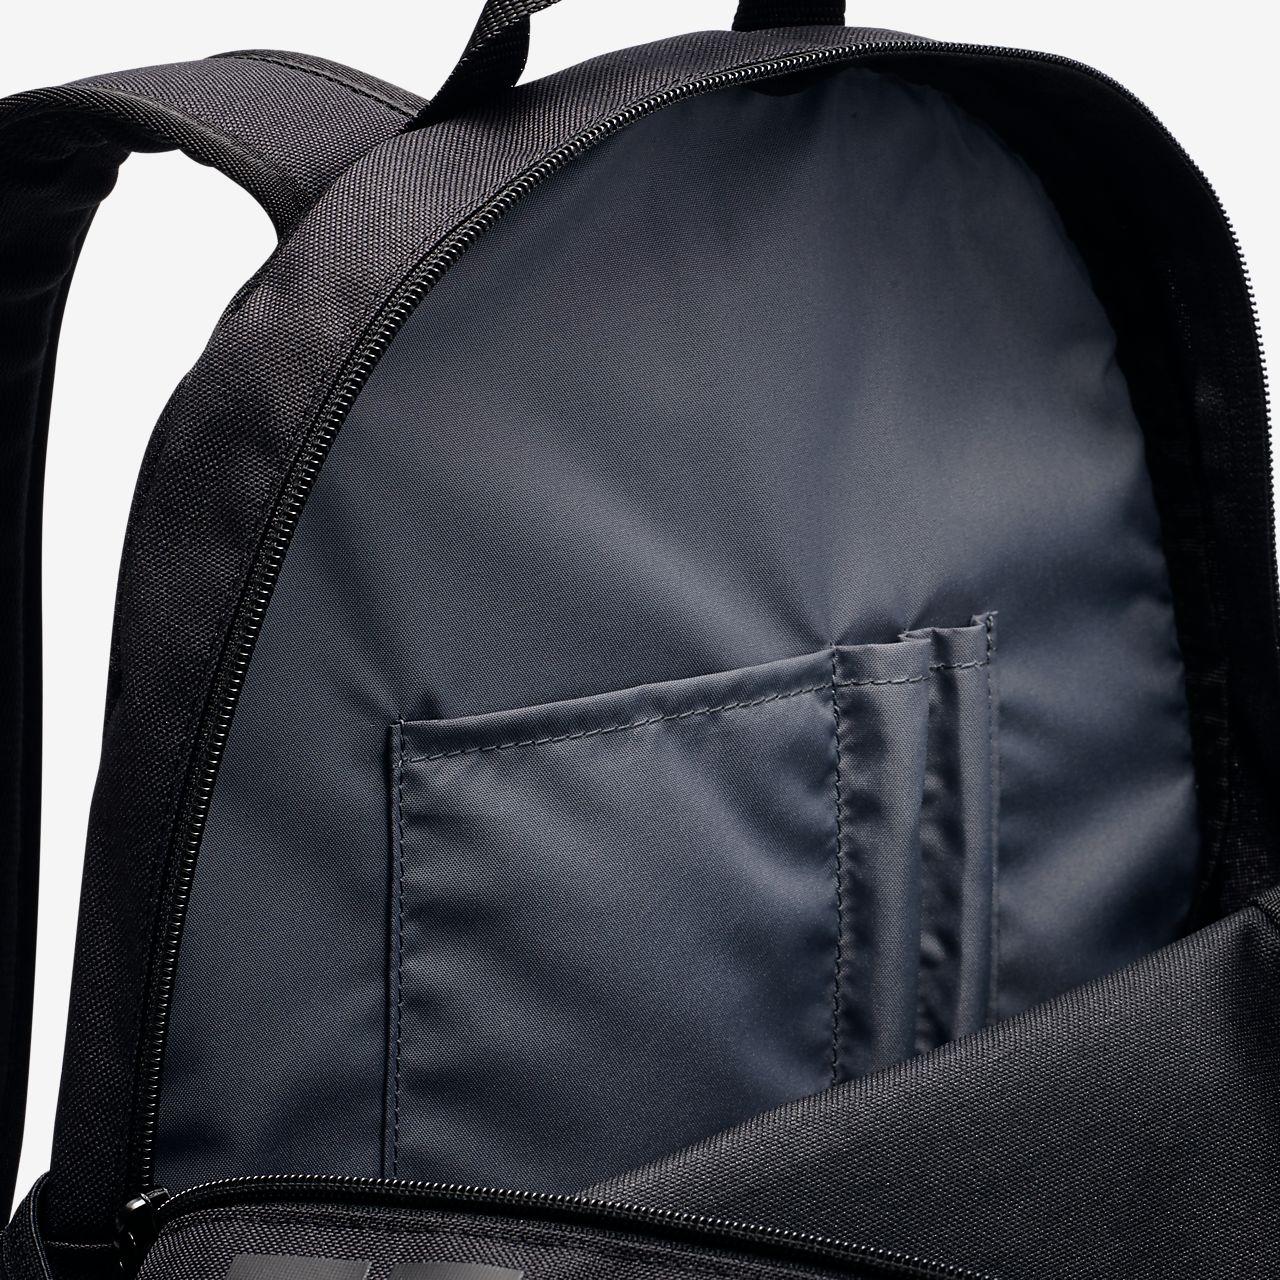 7c804e9d5a93 Nike Brasilia Kids  Backpack. Nike.com CA